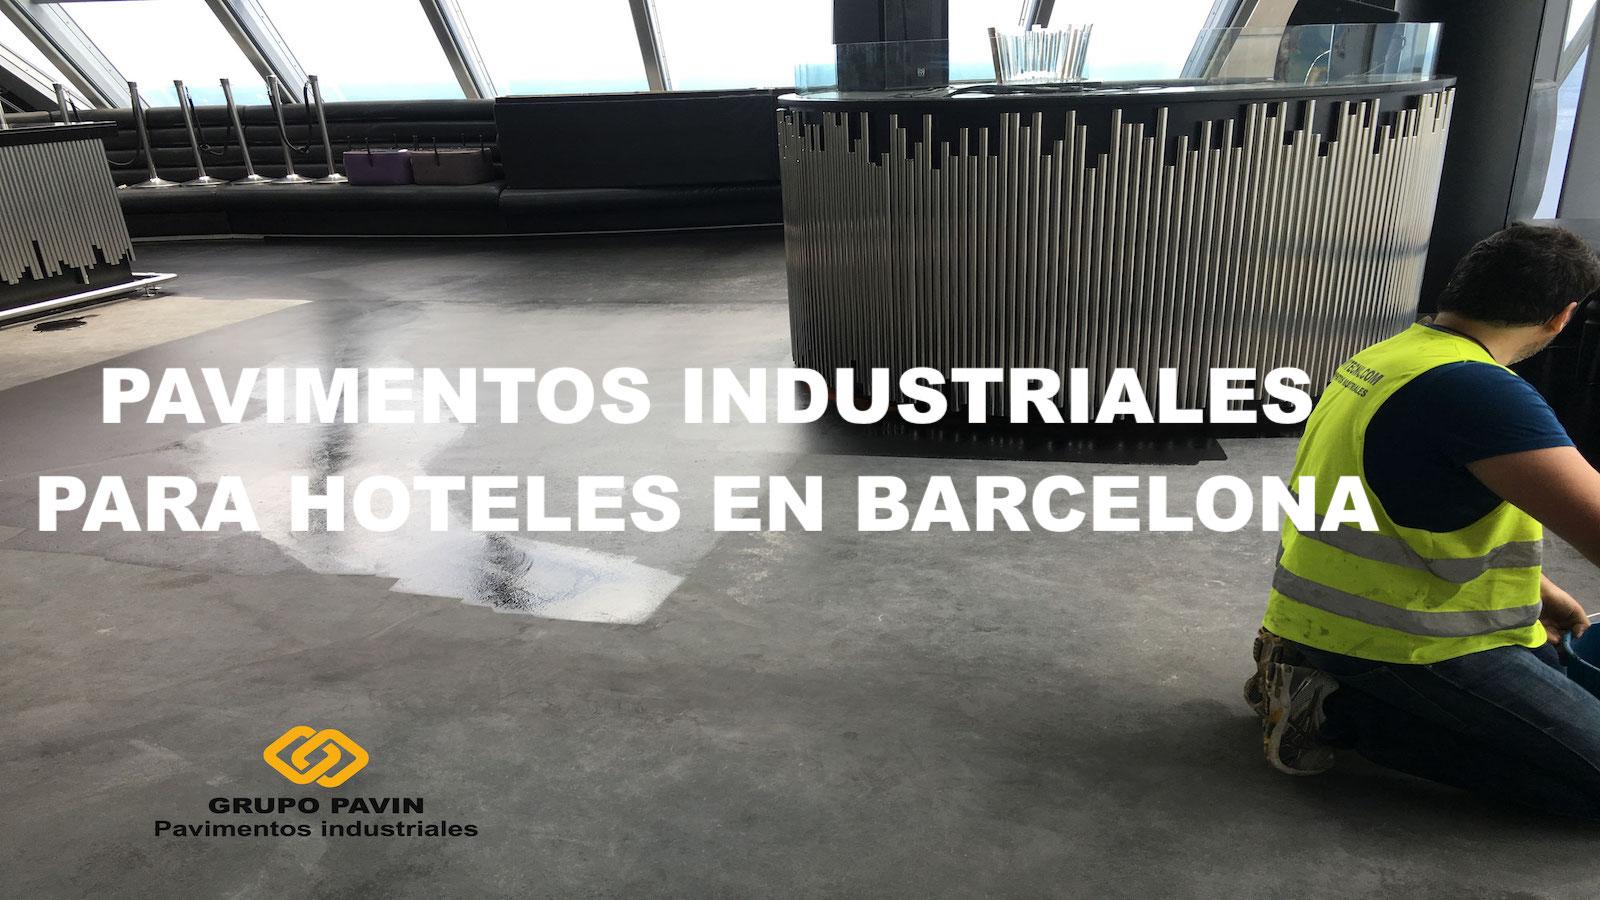 Pavimentos industriales para hoteles